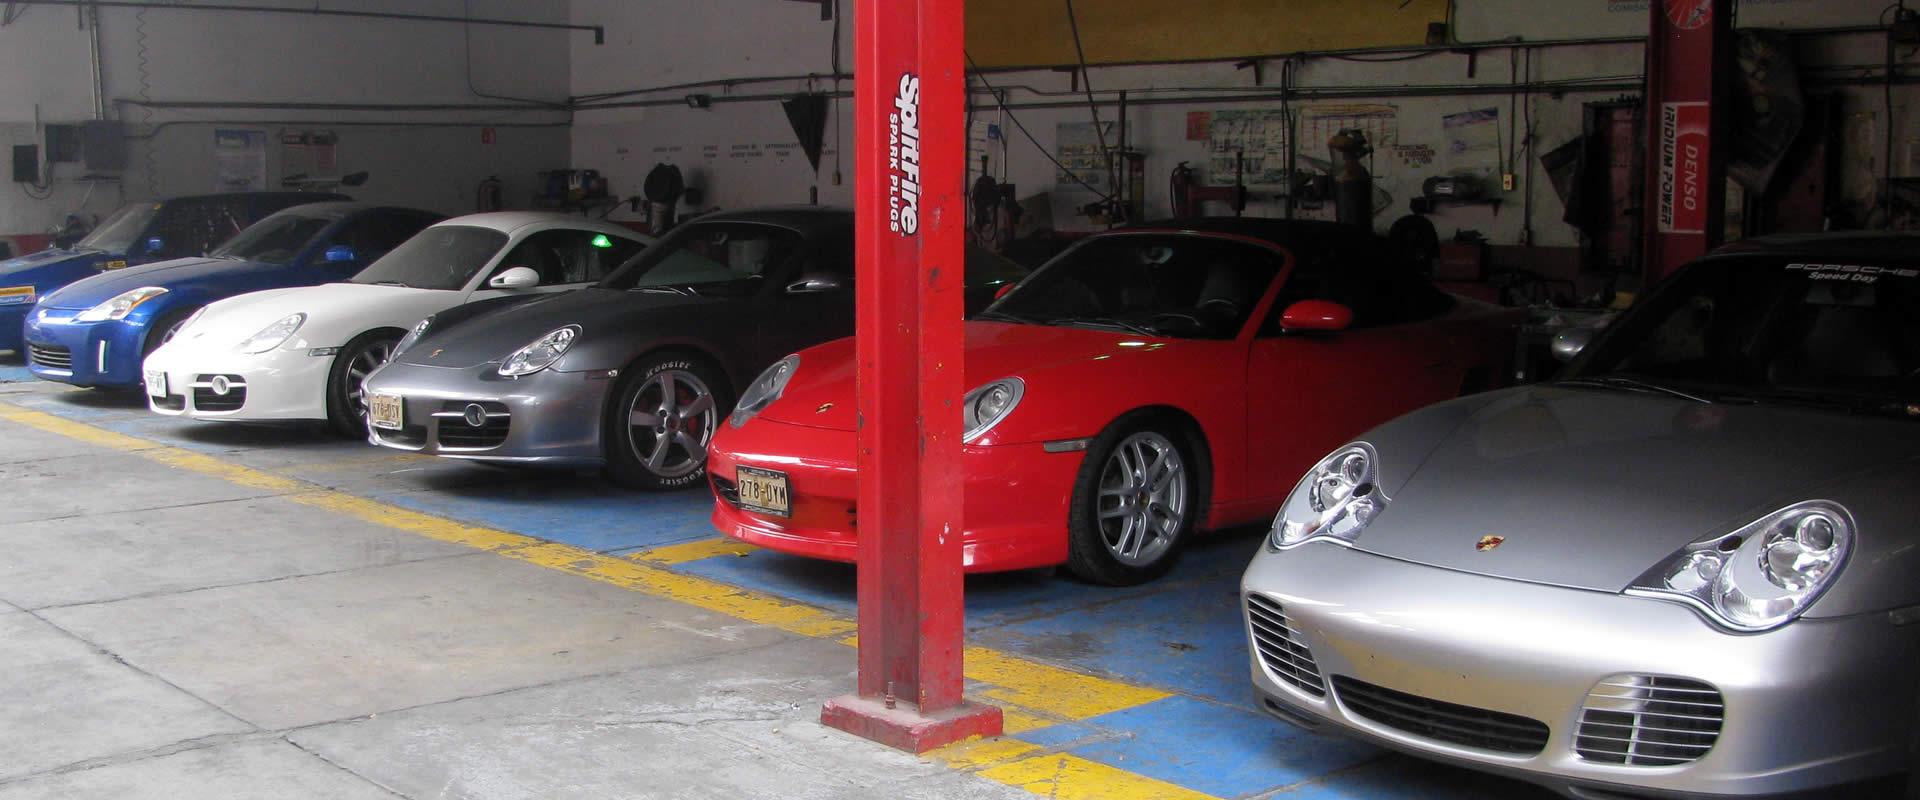 Mantenimiento Porsche